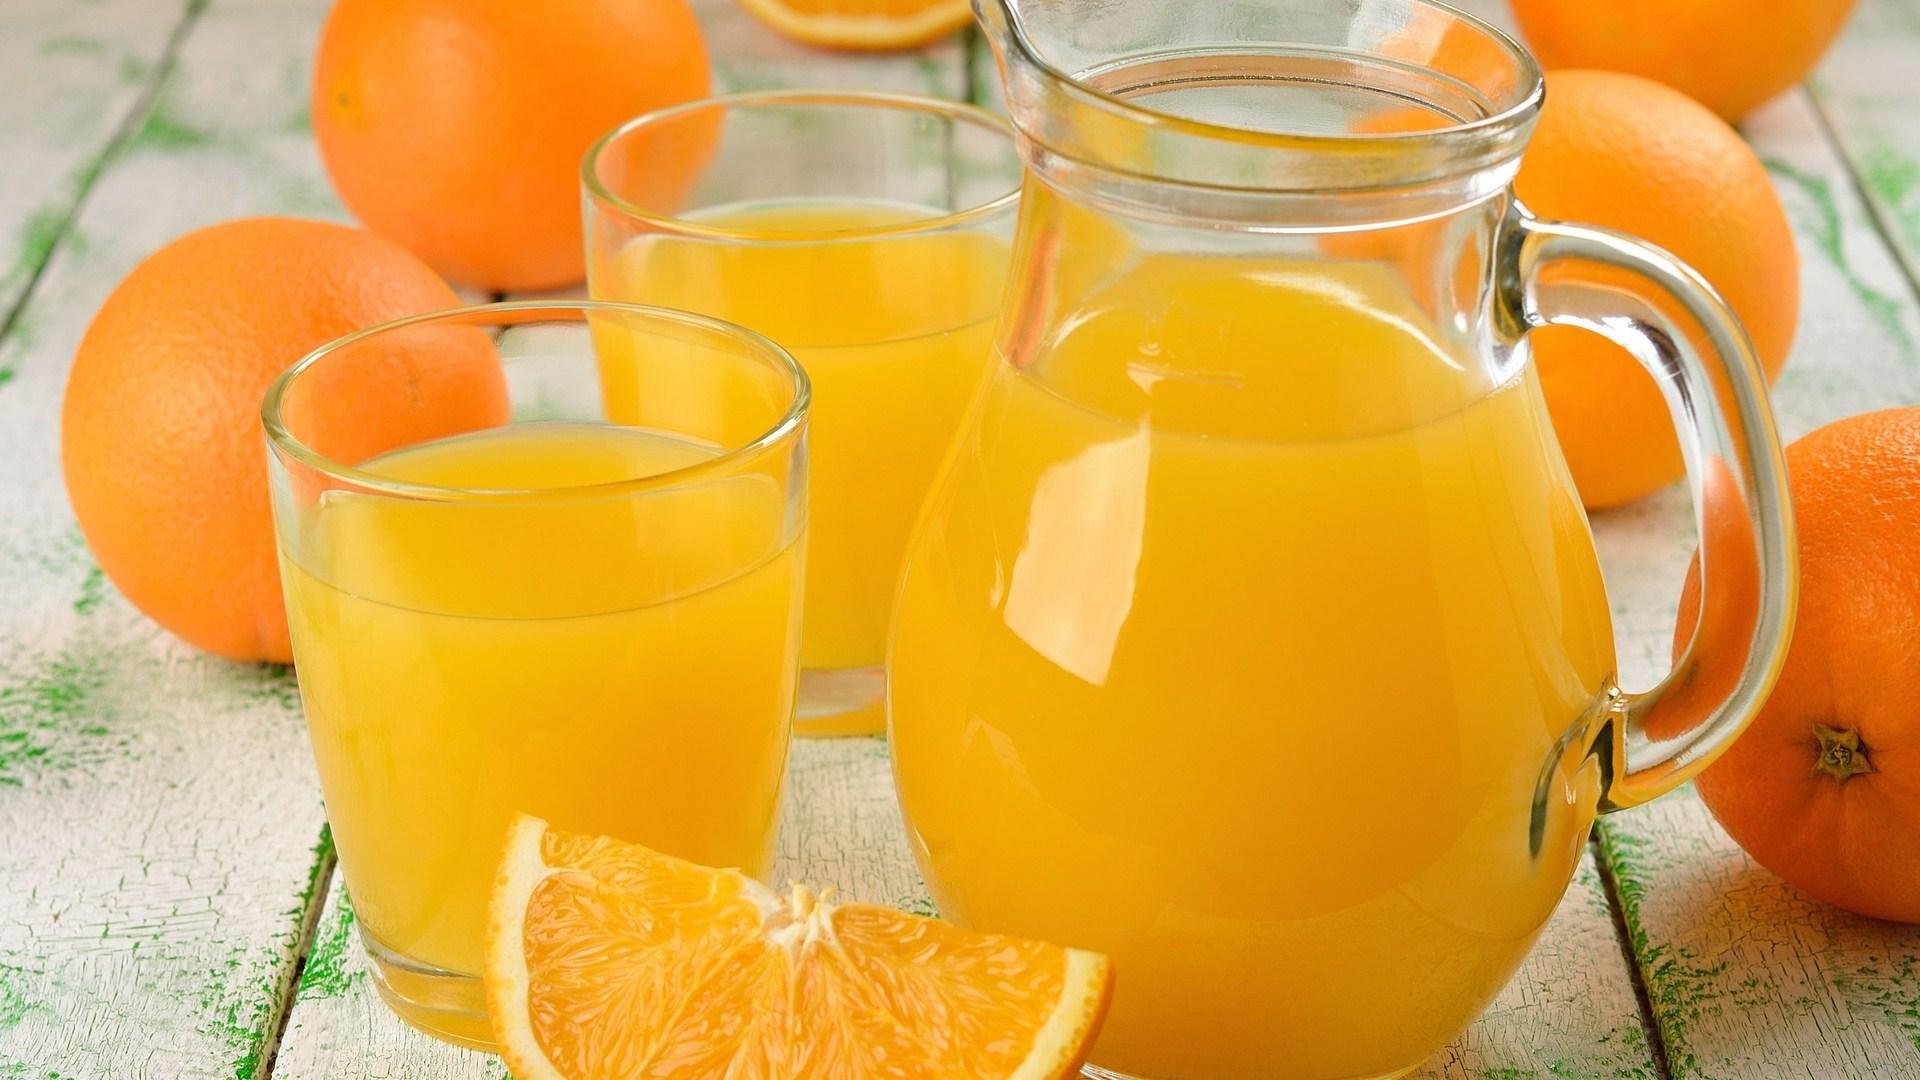 orange-juice-35043-35847-hd-wallpapers